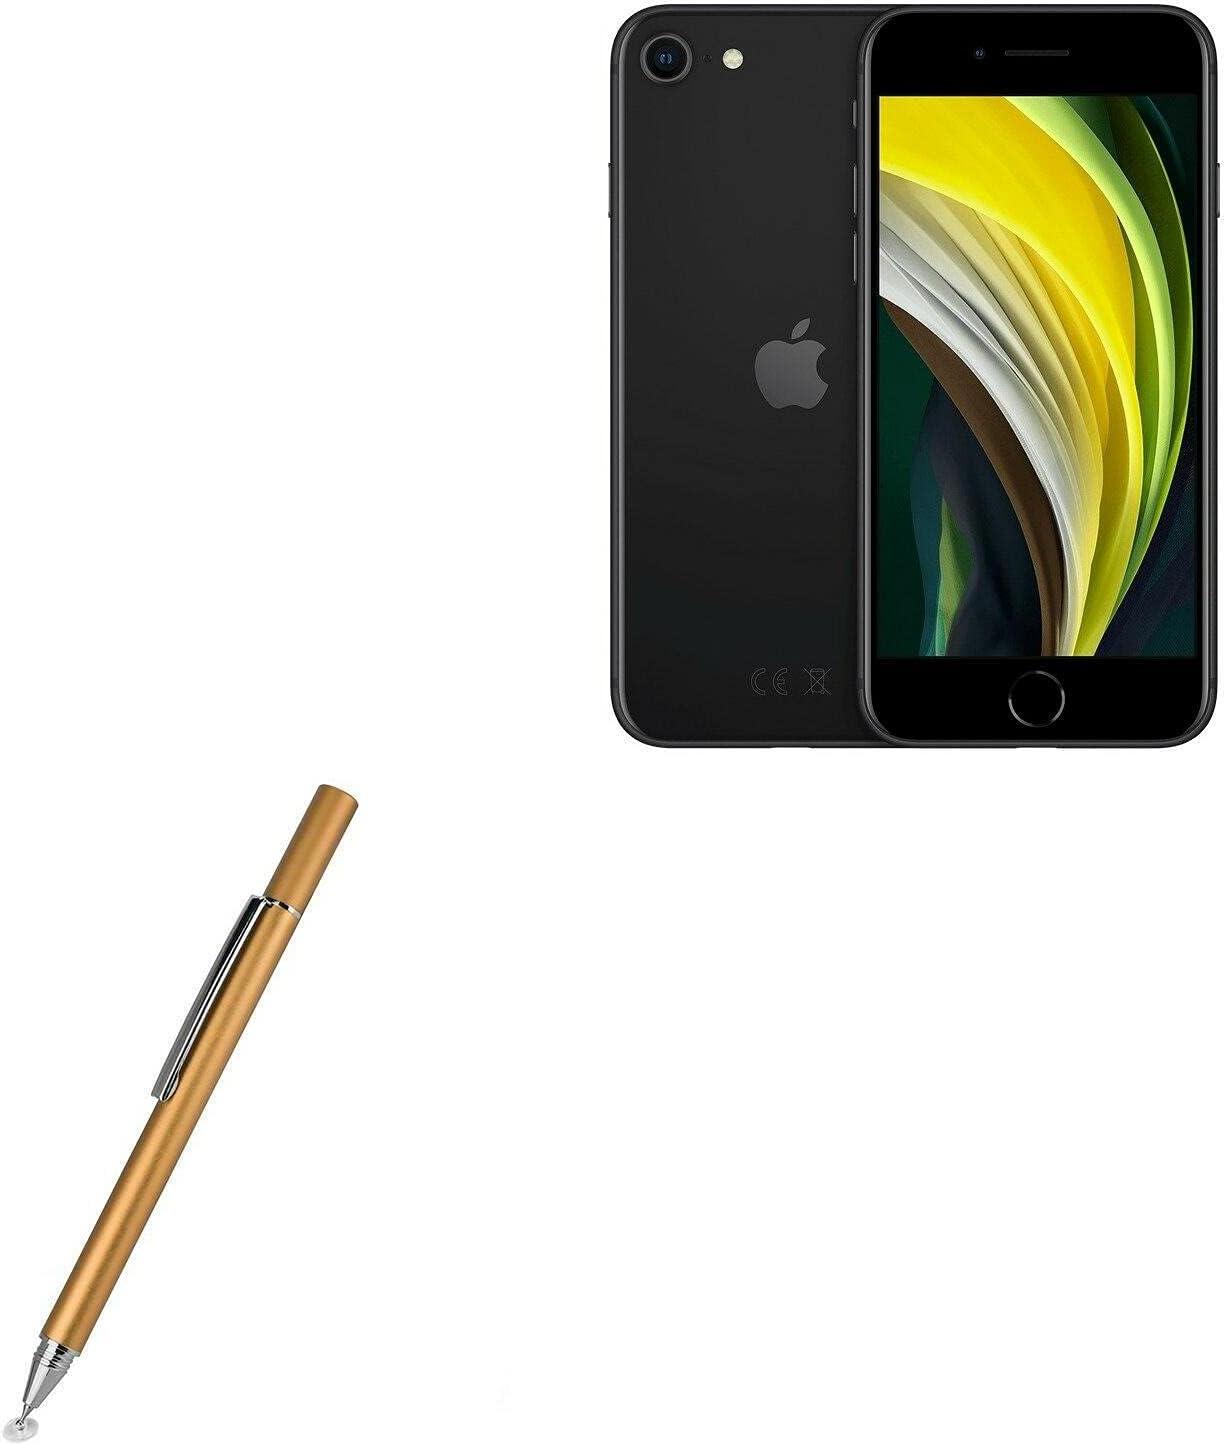 Stylus Pen for Apple iPhone SE (2020) (Stylus Pen by BoxWave) - FineTouch Capacitive Stylus, Super Precise Stylus Pen for Apple iPhone SE (2020) - Champagne Gold